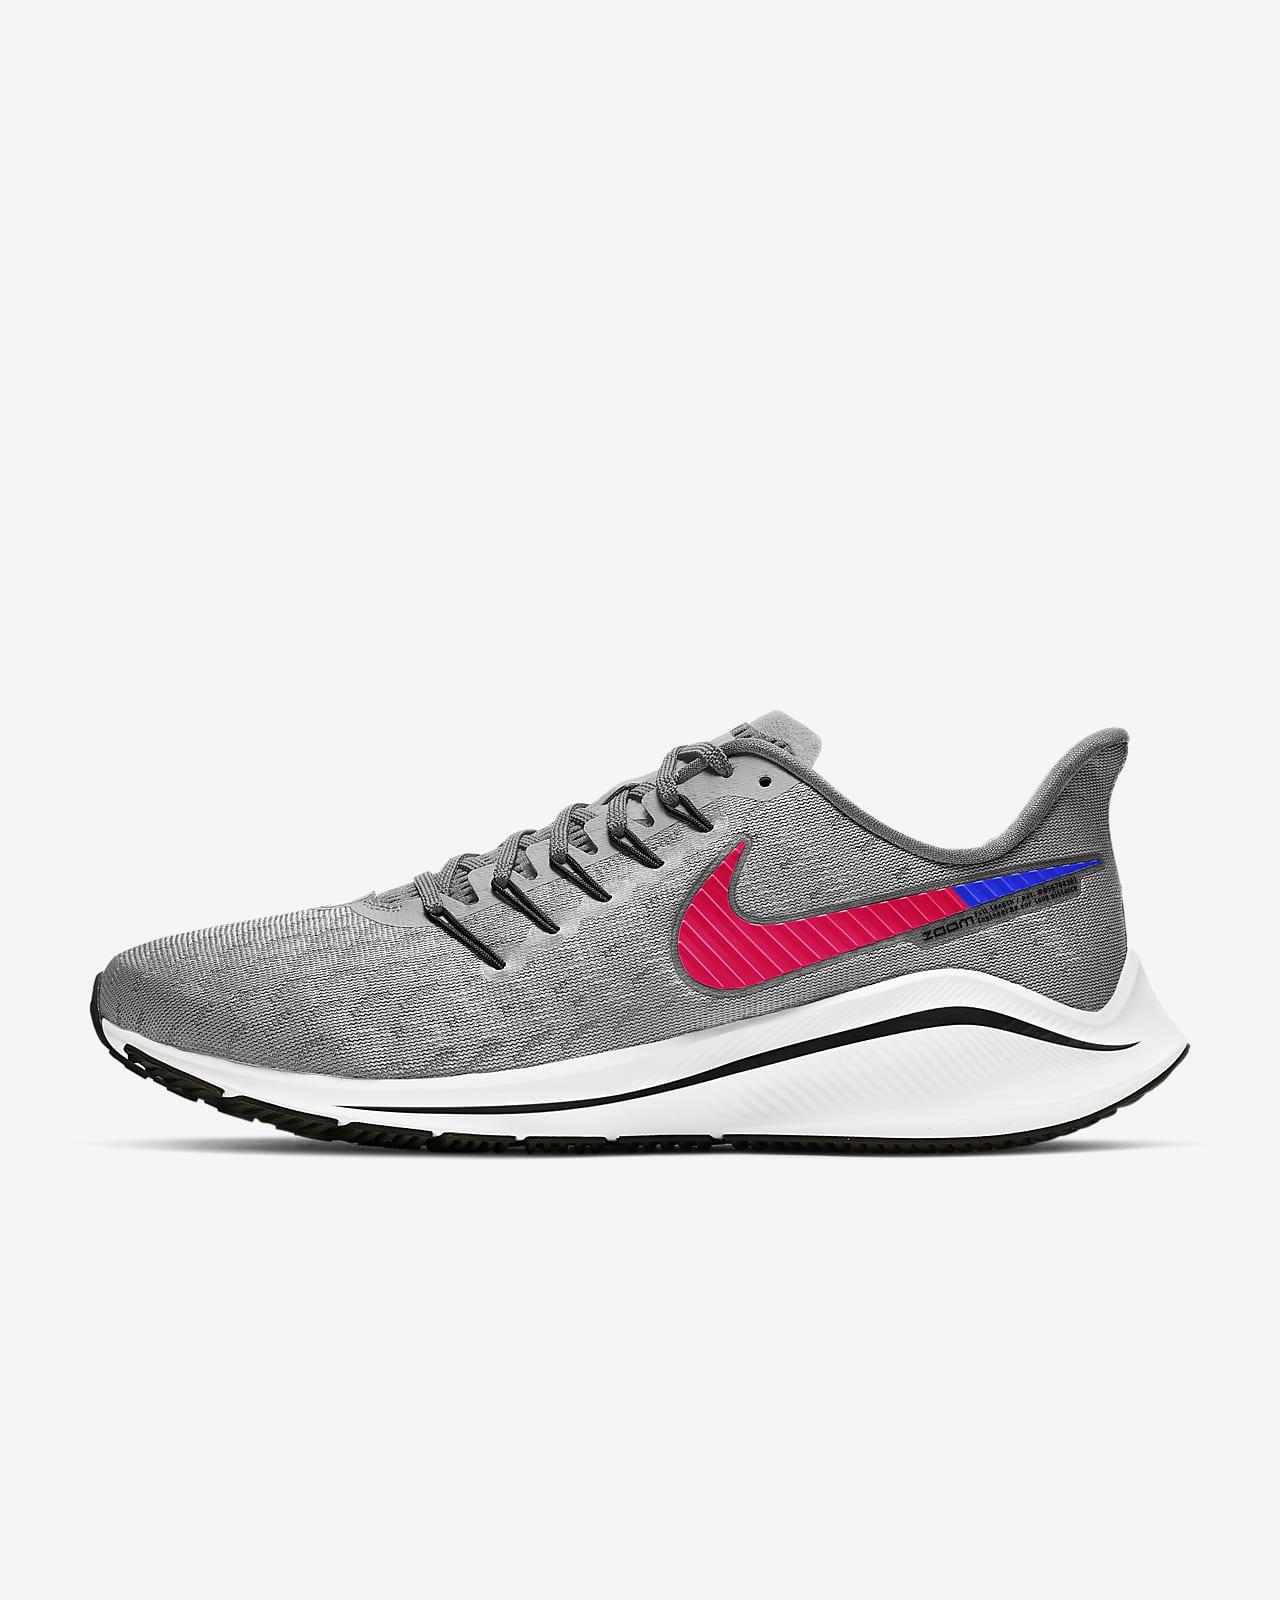 Abrumar veredicto corazón  Nike Air Zoom Vomero 14 Men's Running Shoe. Nike ZA